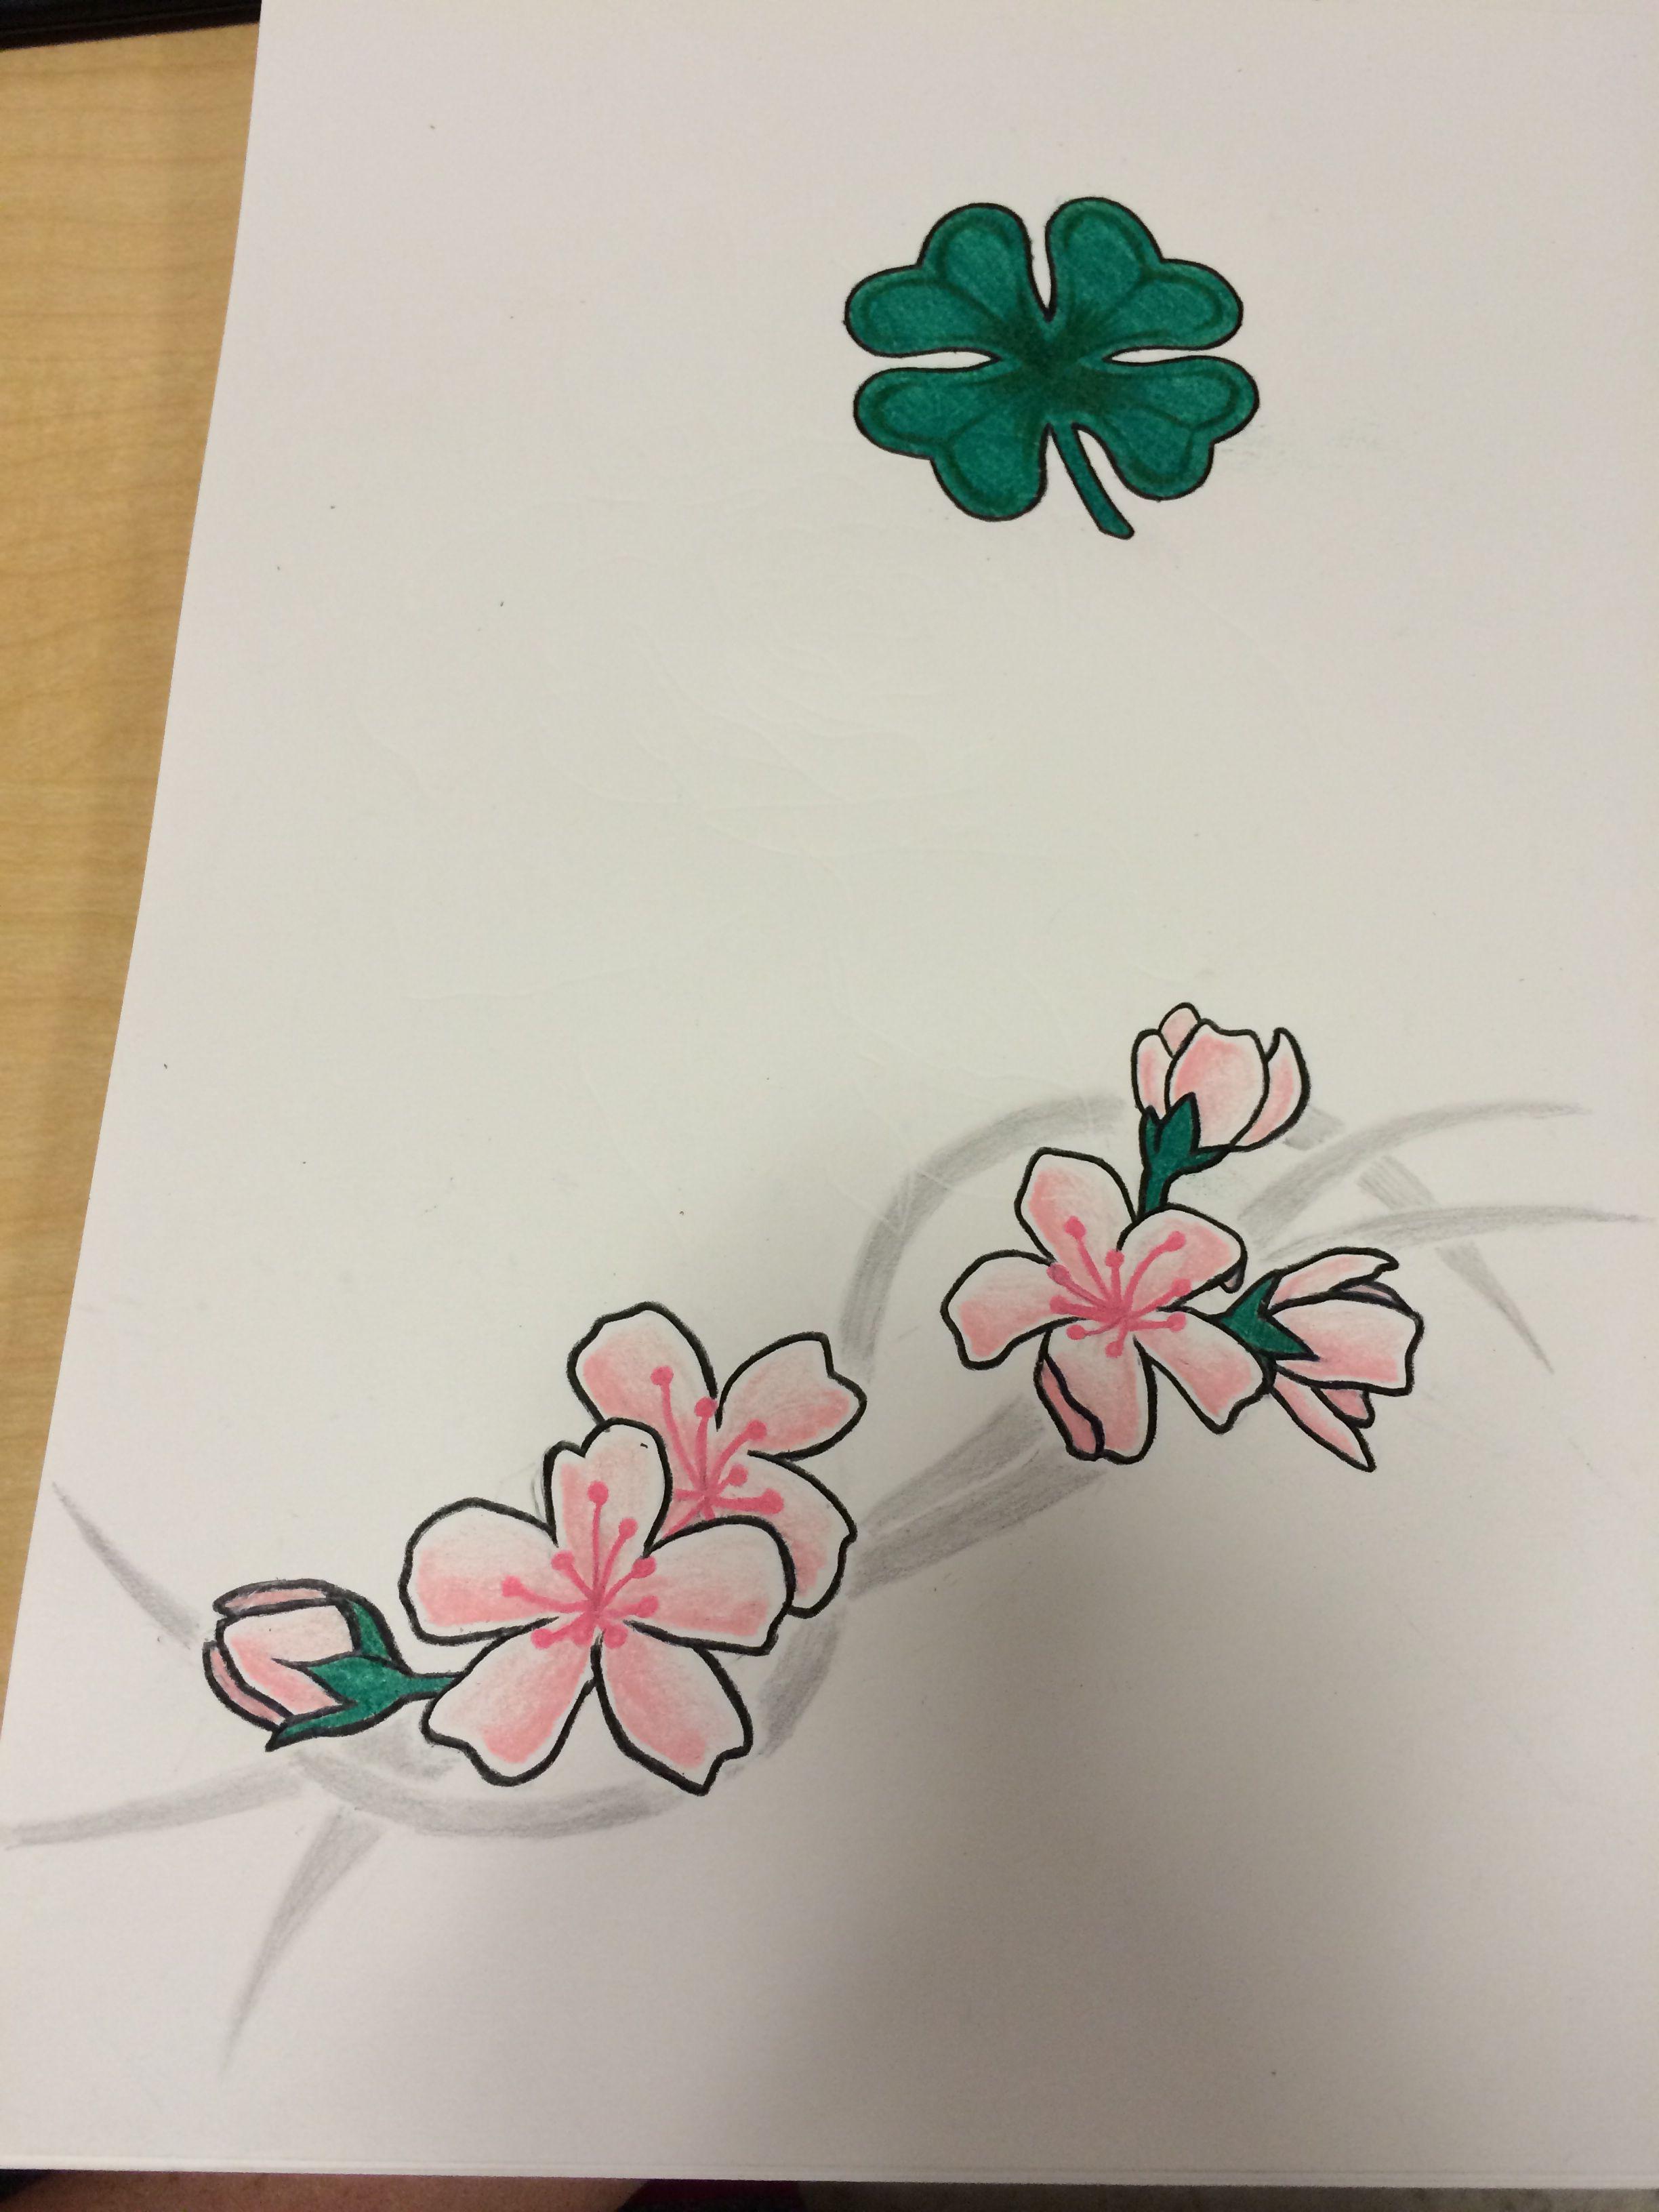 Some tattoo designs for my boss. #clover #fourleafclover #flowers #cherryblossom #tattoo #tattoodesign